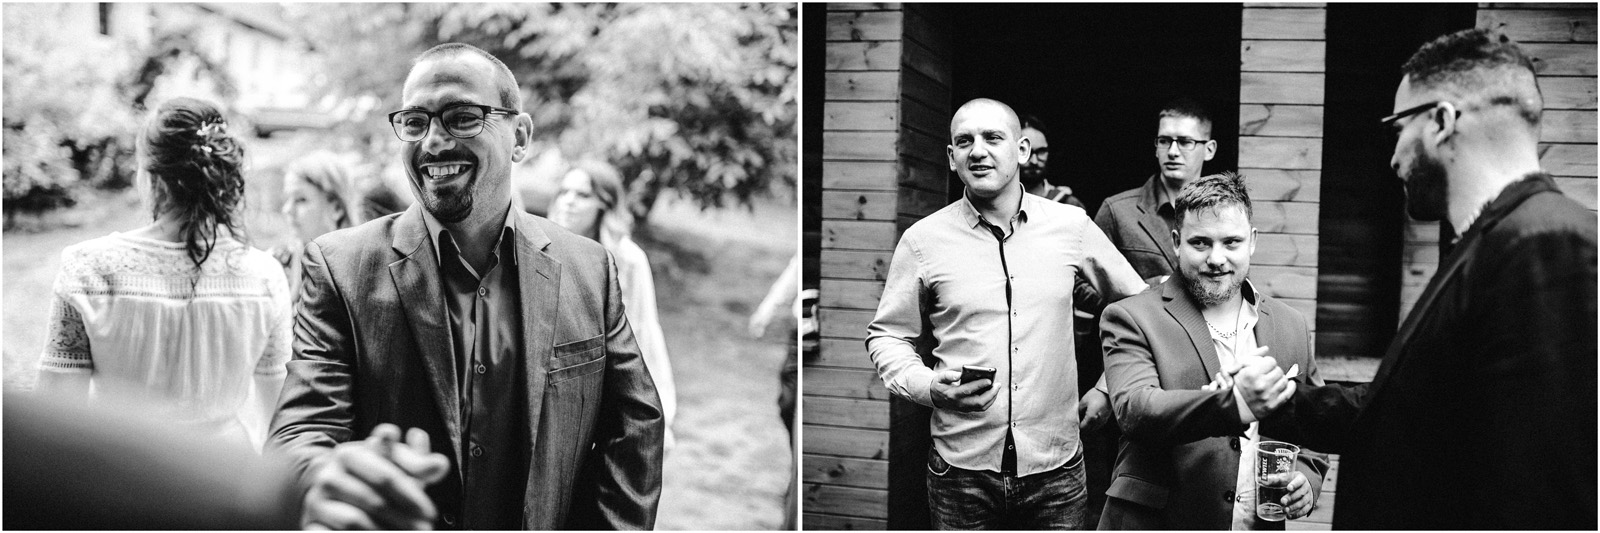 Agatka & Mati | garden party i impreza w stodole 27